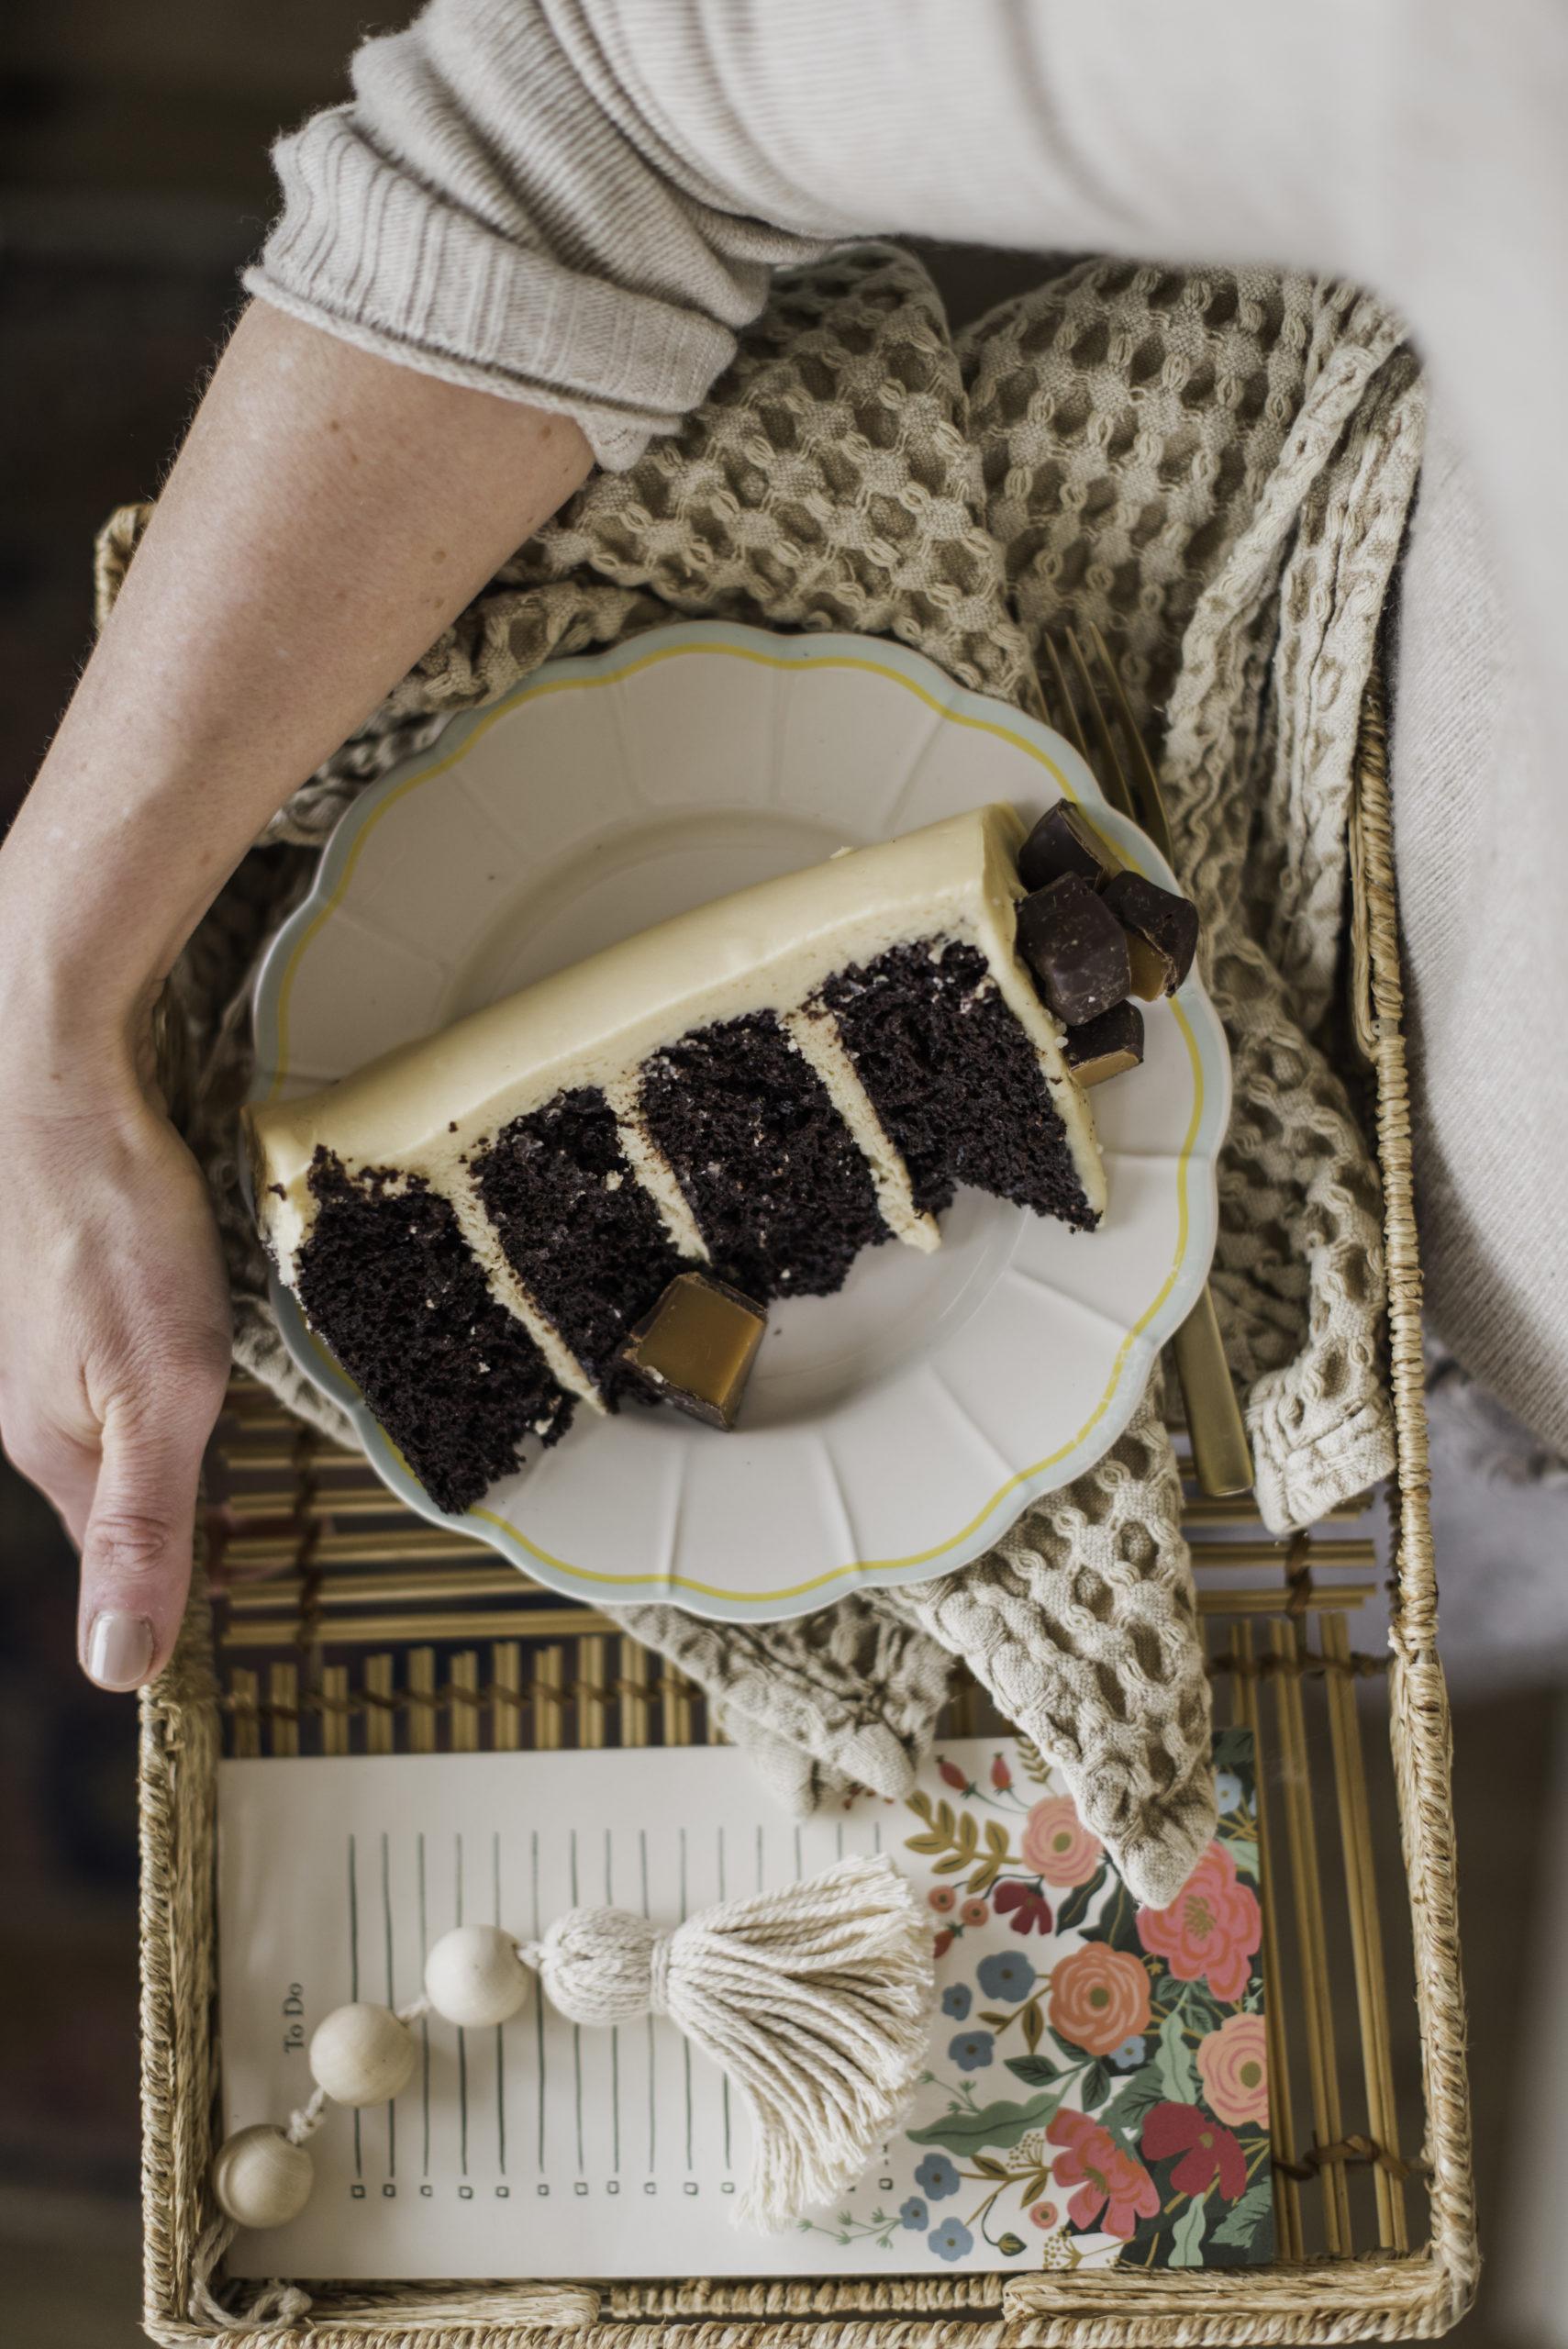 Chocolate Salted Caramel Cake -rich, dark chocolate cake layers with a delicious salted caramel buttercream. #cakerecipe #cakerecipesforfathersday #fathersdaycakes #cake #chocolatecake #bestchocolatecakerecipe